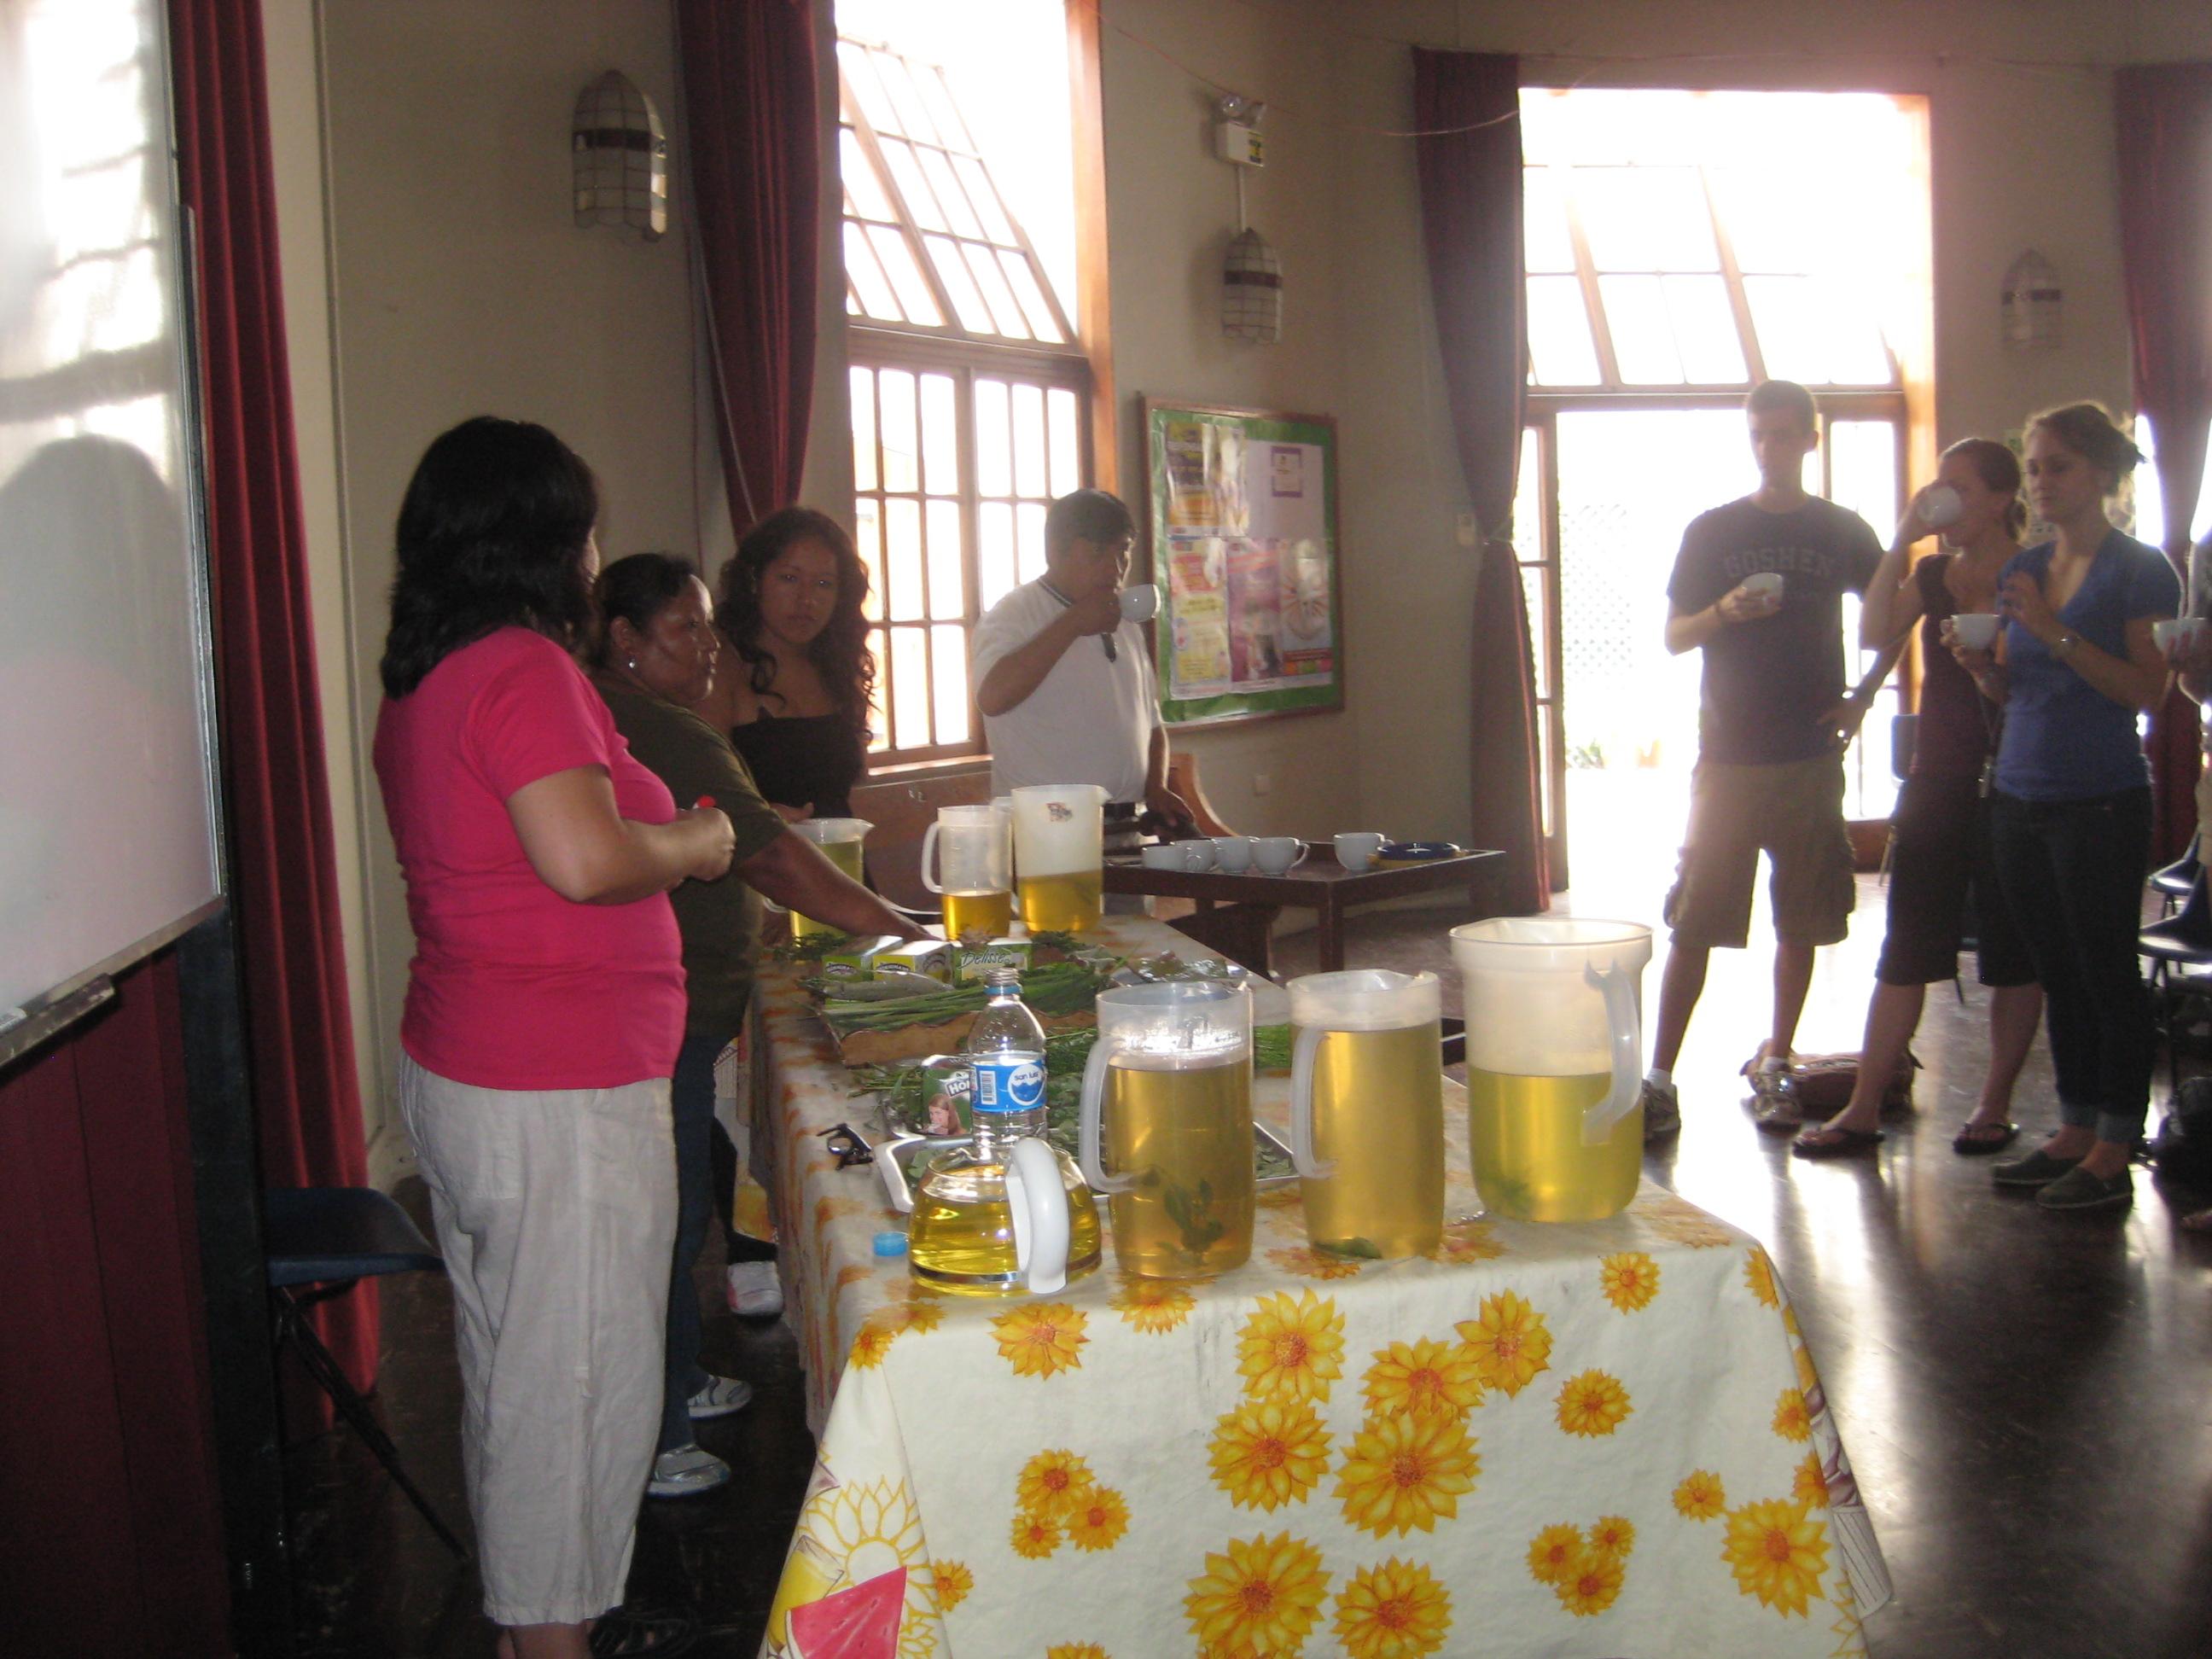 Alicia presents a workshop on medicinal teas; study coordinator Celia translates